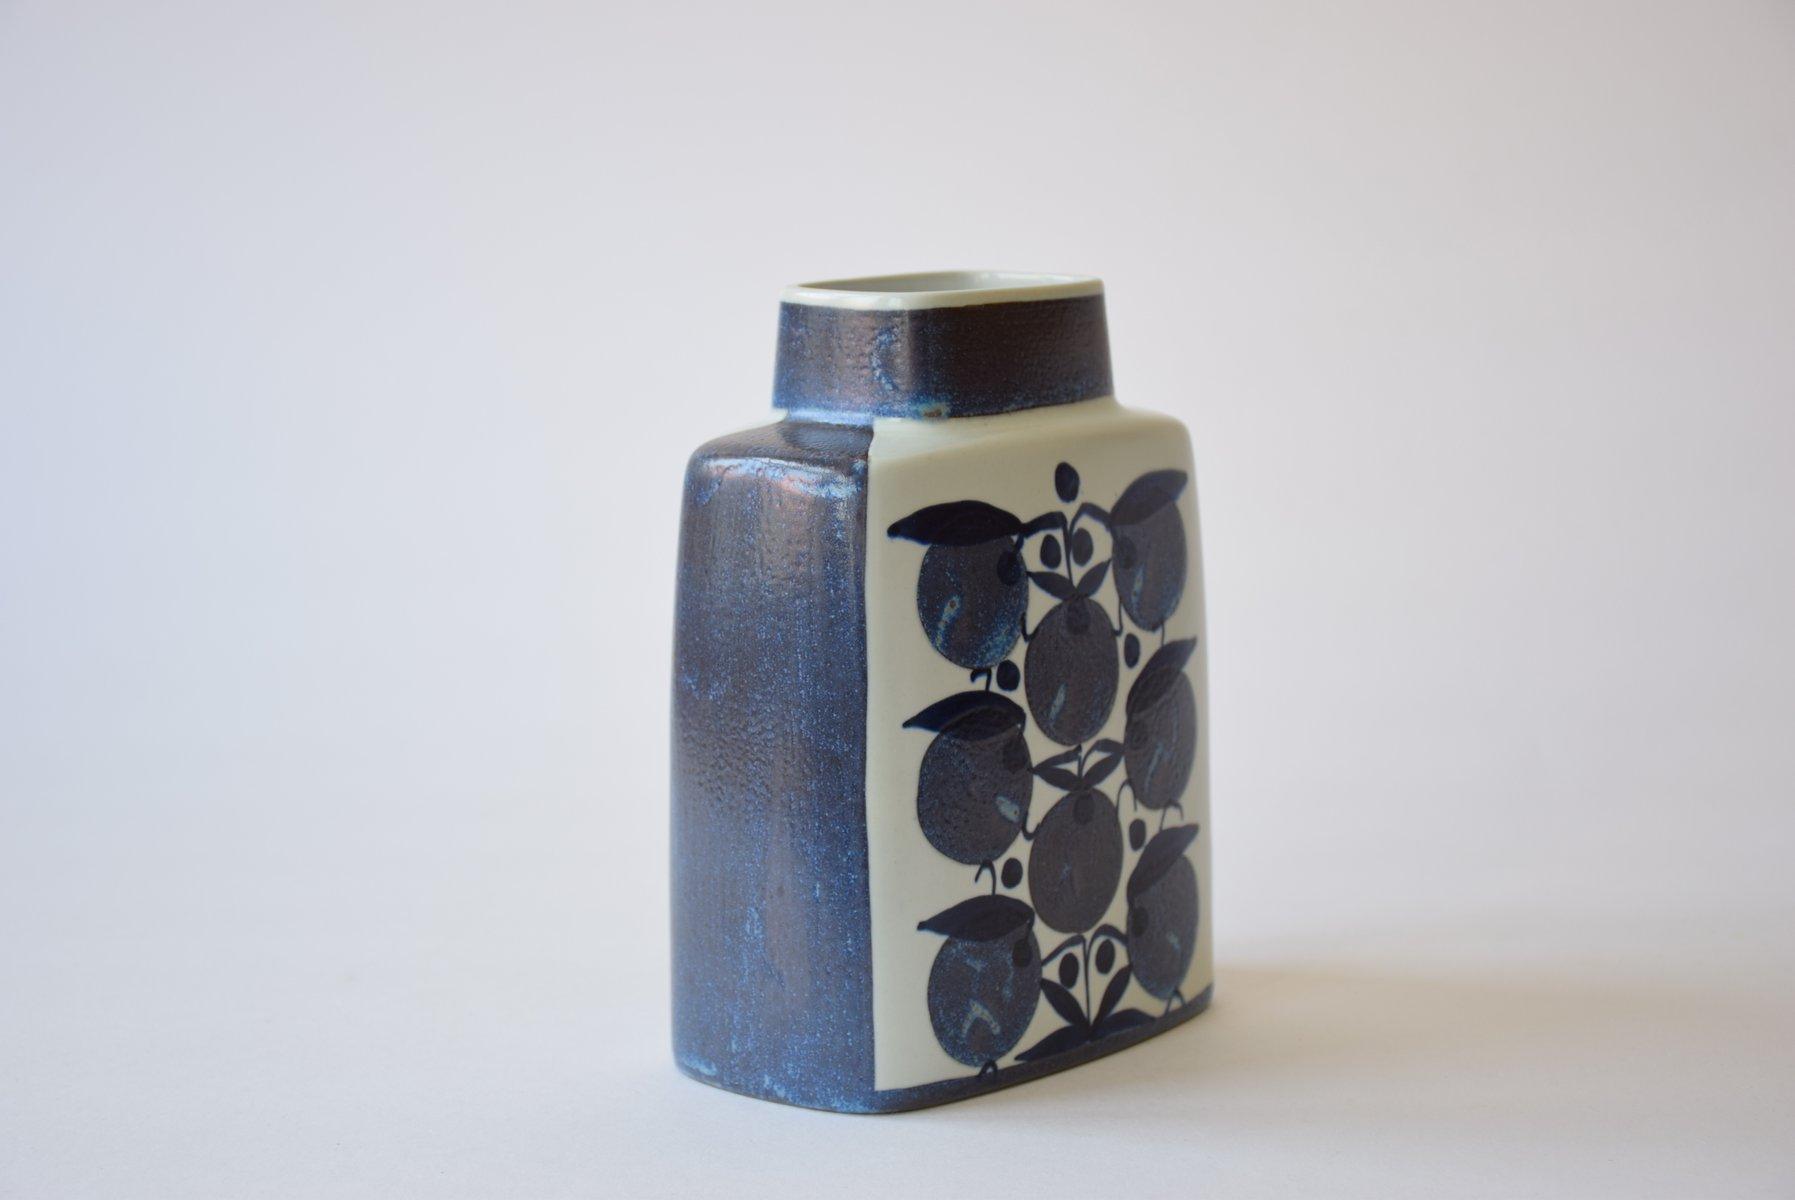 Mid Century Scandinavian Tenera Vase By Grethe Helland Hansen For Royal